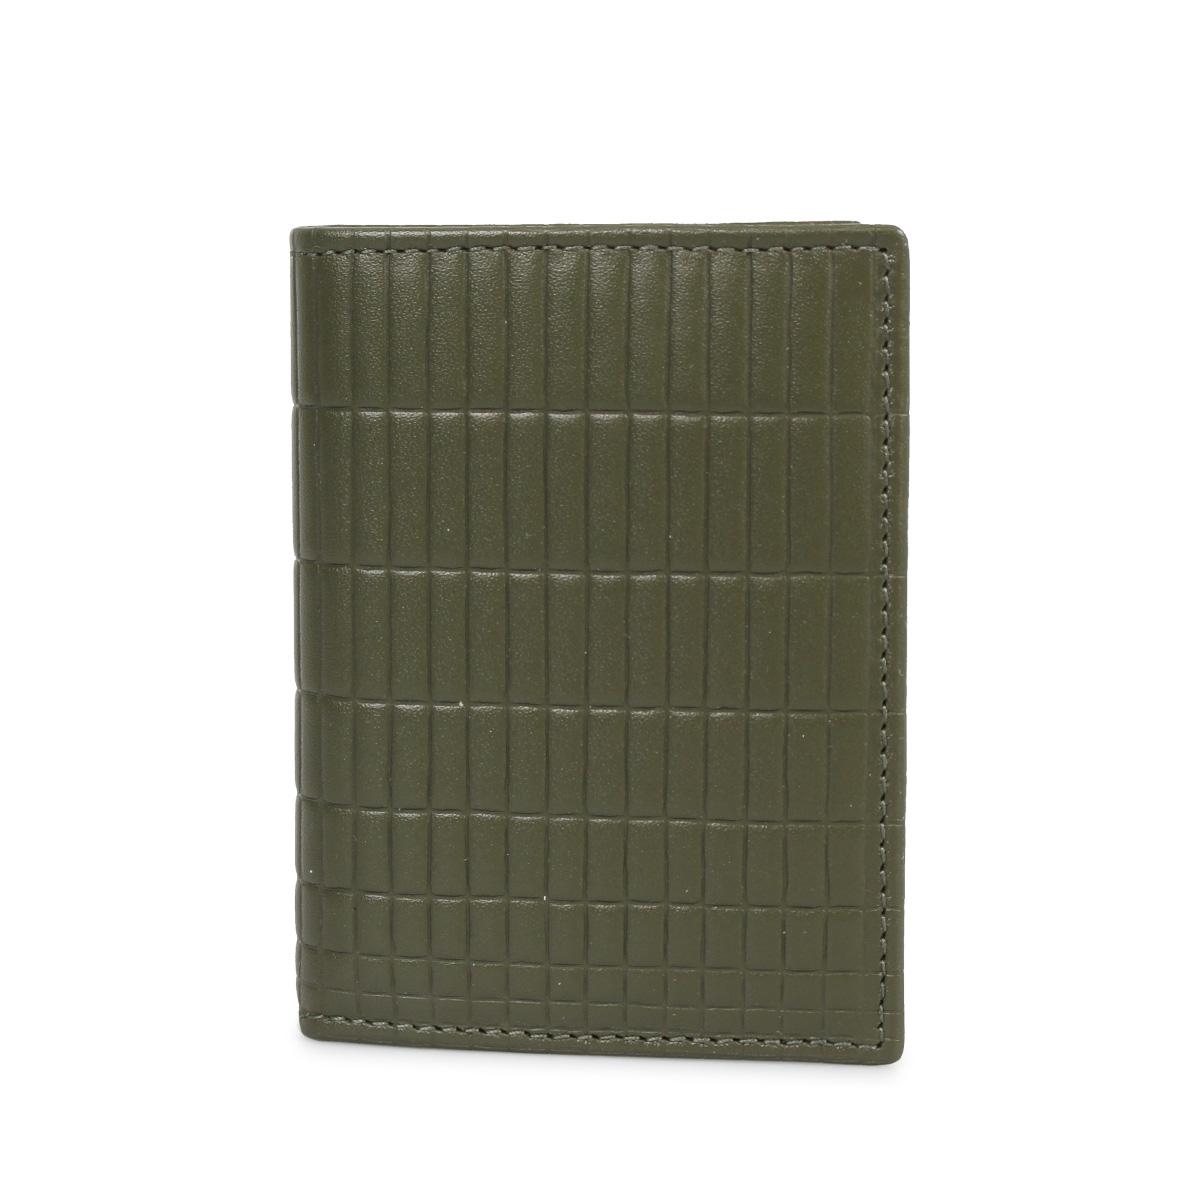 COMME des GARCONS BRICK LINE WALLET コムデギャルソン 財布 二つ折り メンズ レディース カーキ SA0641BK